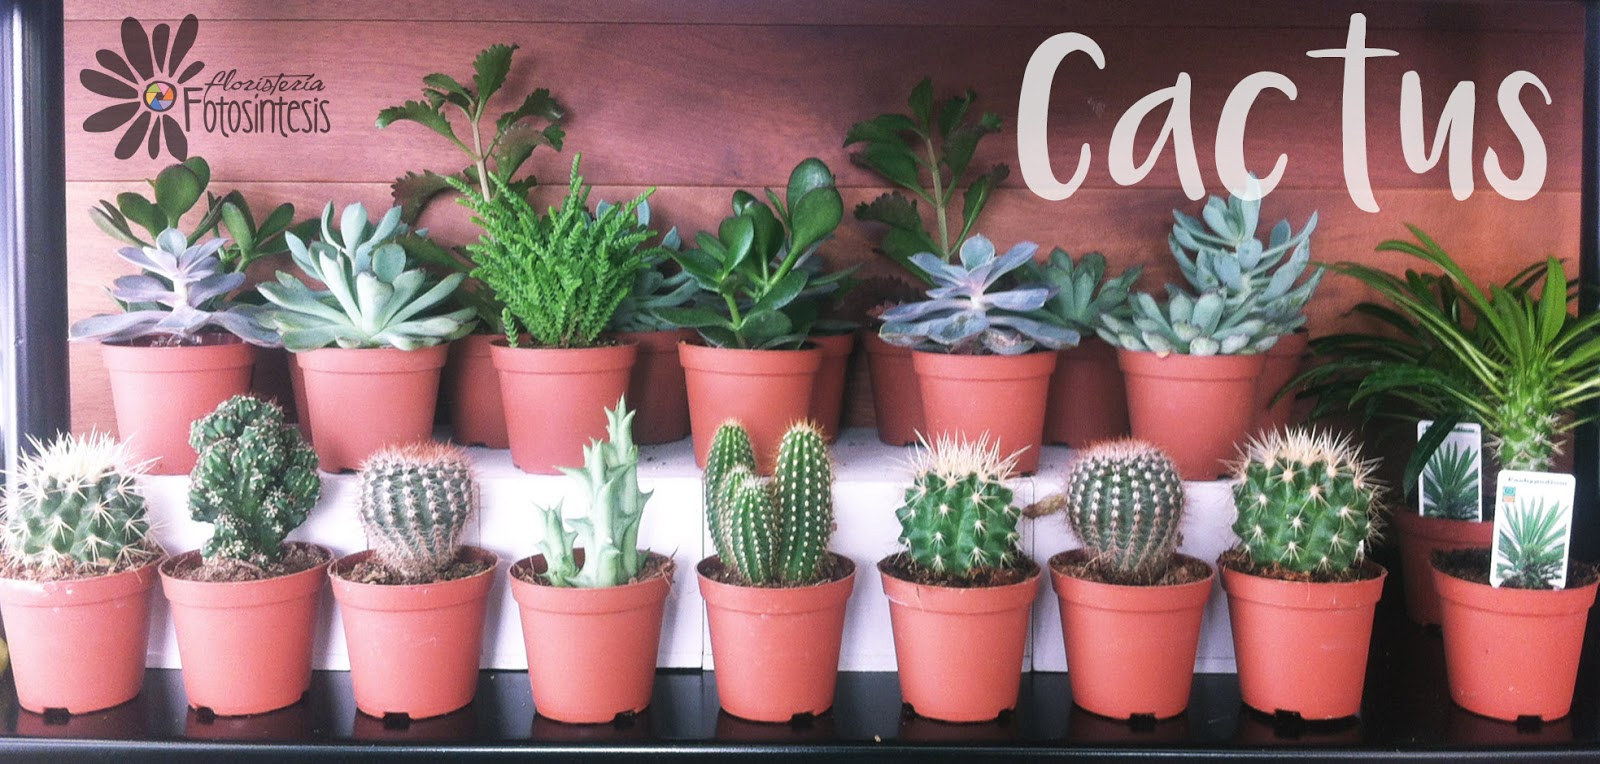 Cactus florister a fotos ntesis - Composiciones de cactus ...